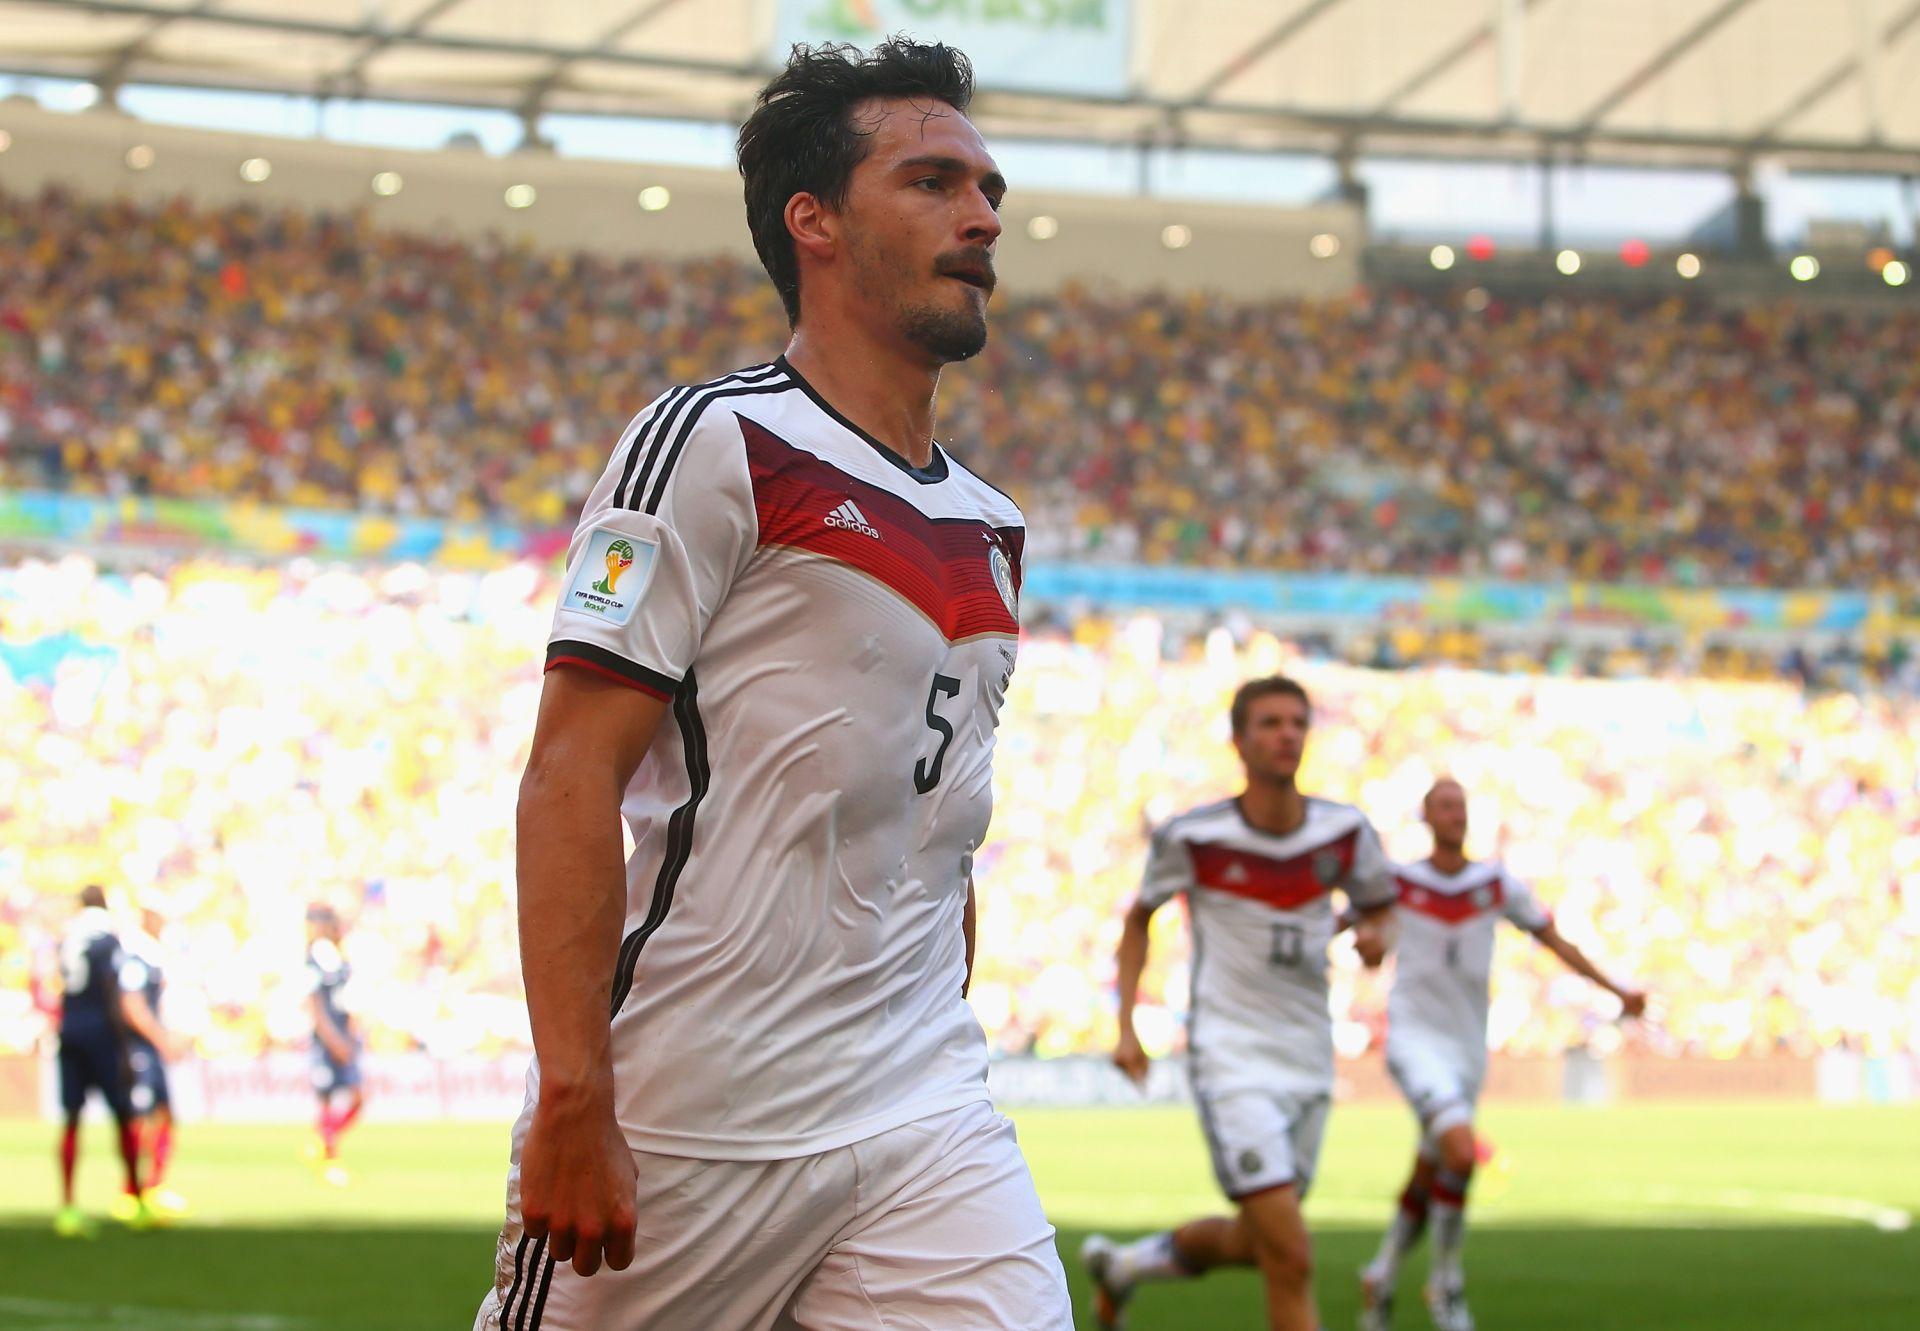 Mats Hummels France Germany World Cup 2014 07042014